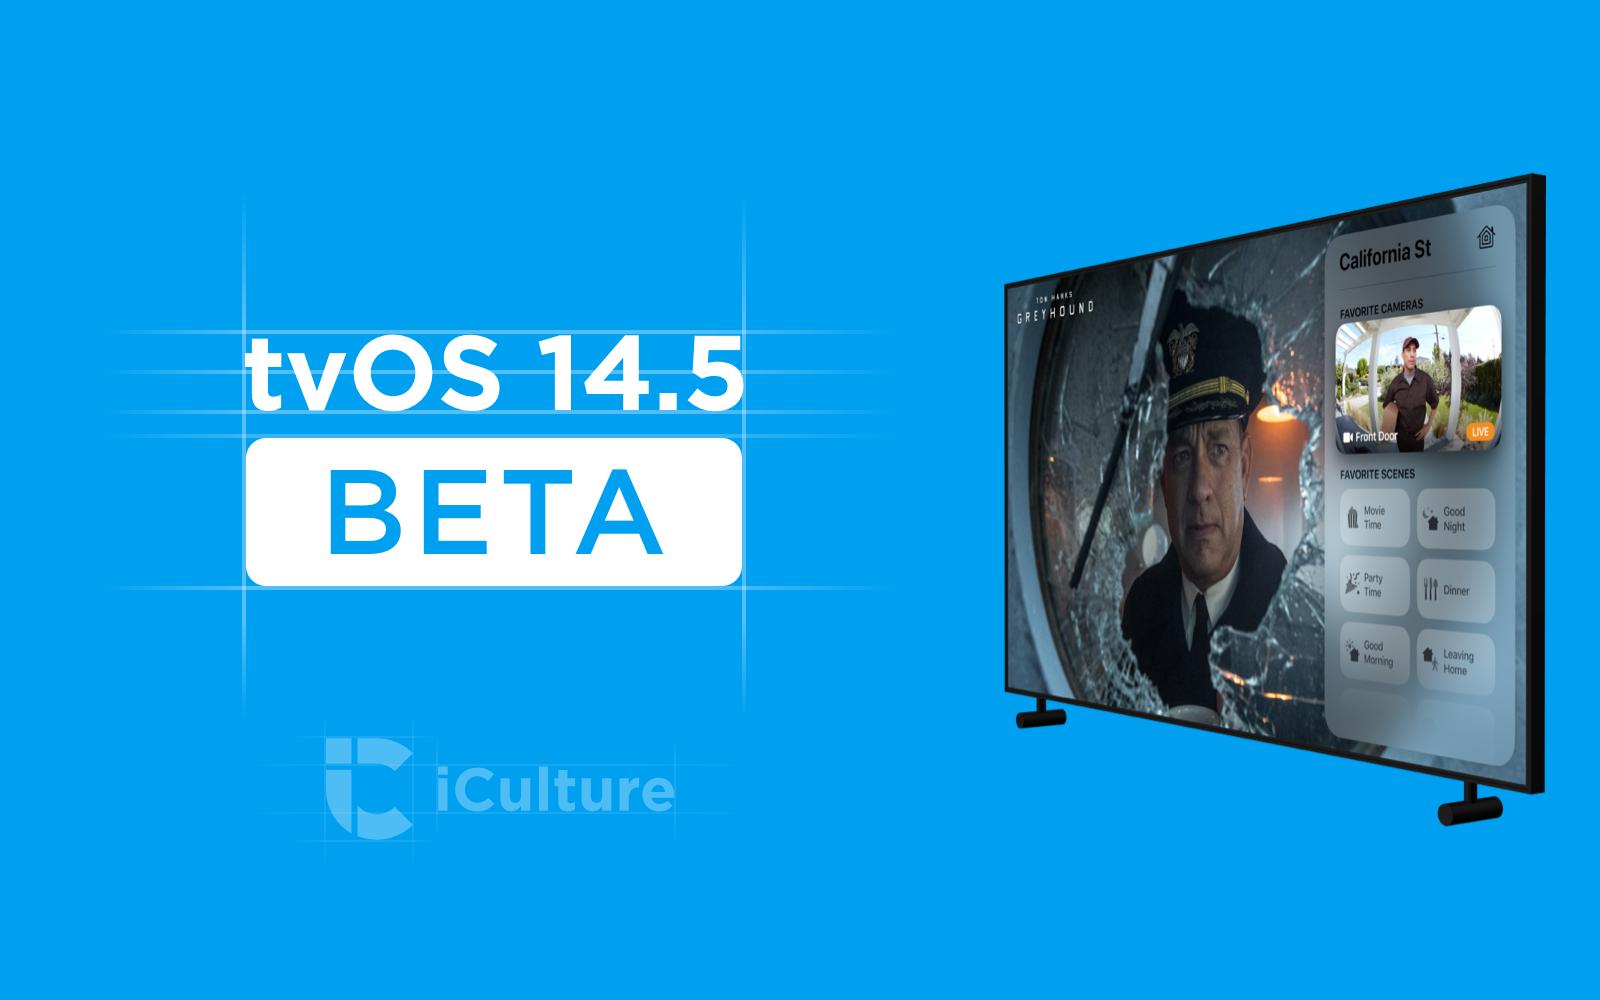 tvOS 14.5 beta.